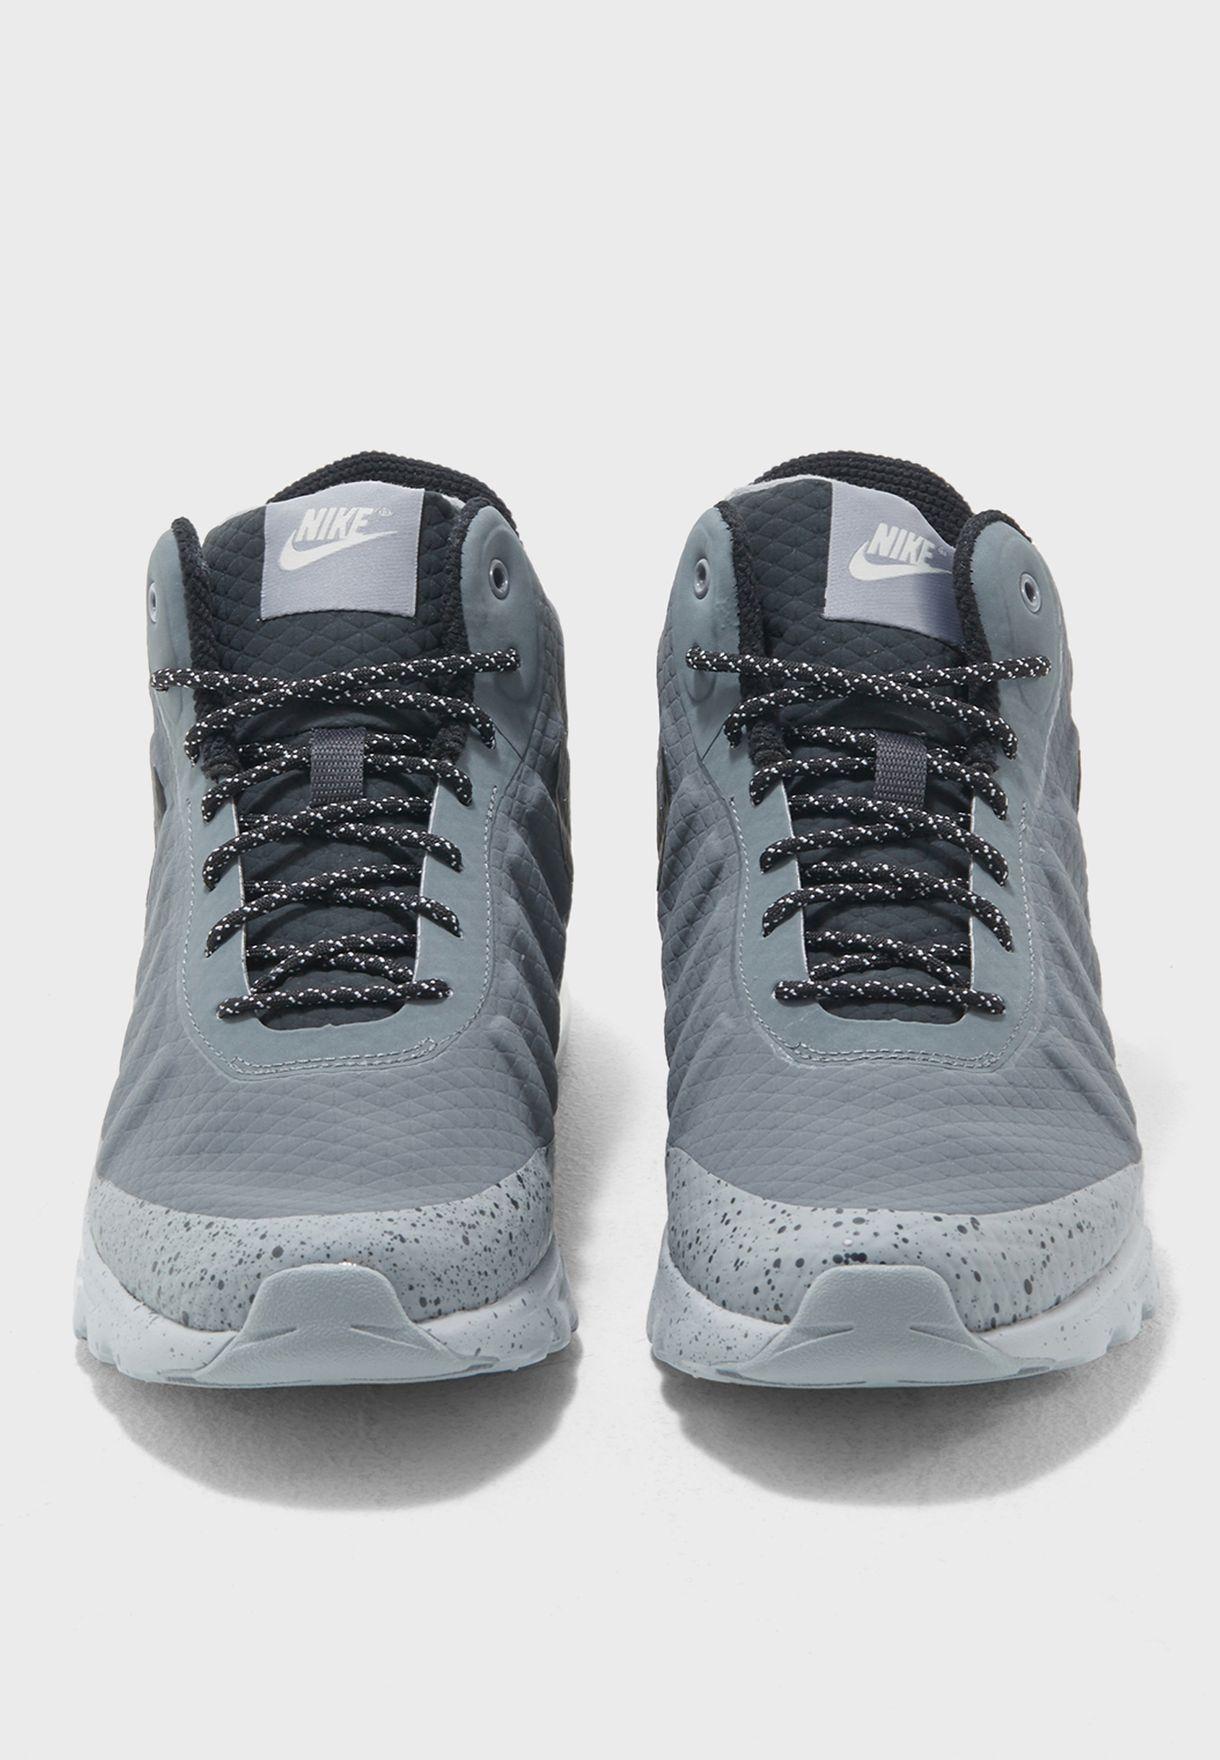 0fdd5fb0f476 Shop Nike grey Air Max Invigor Mid 858654-005 for Men in UAE ...